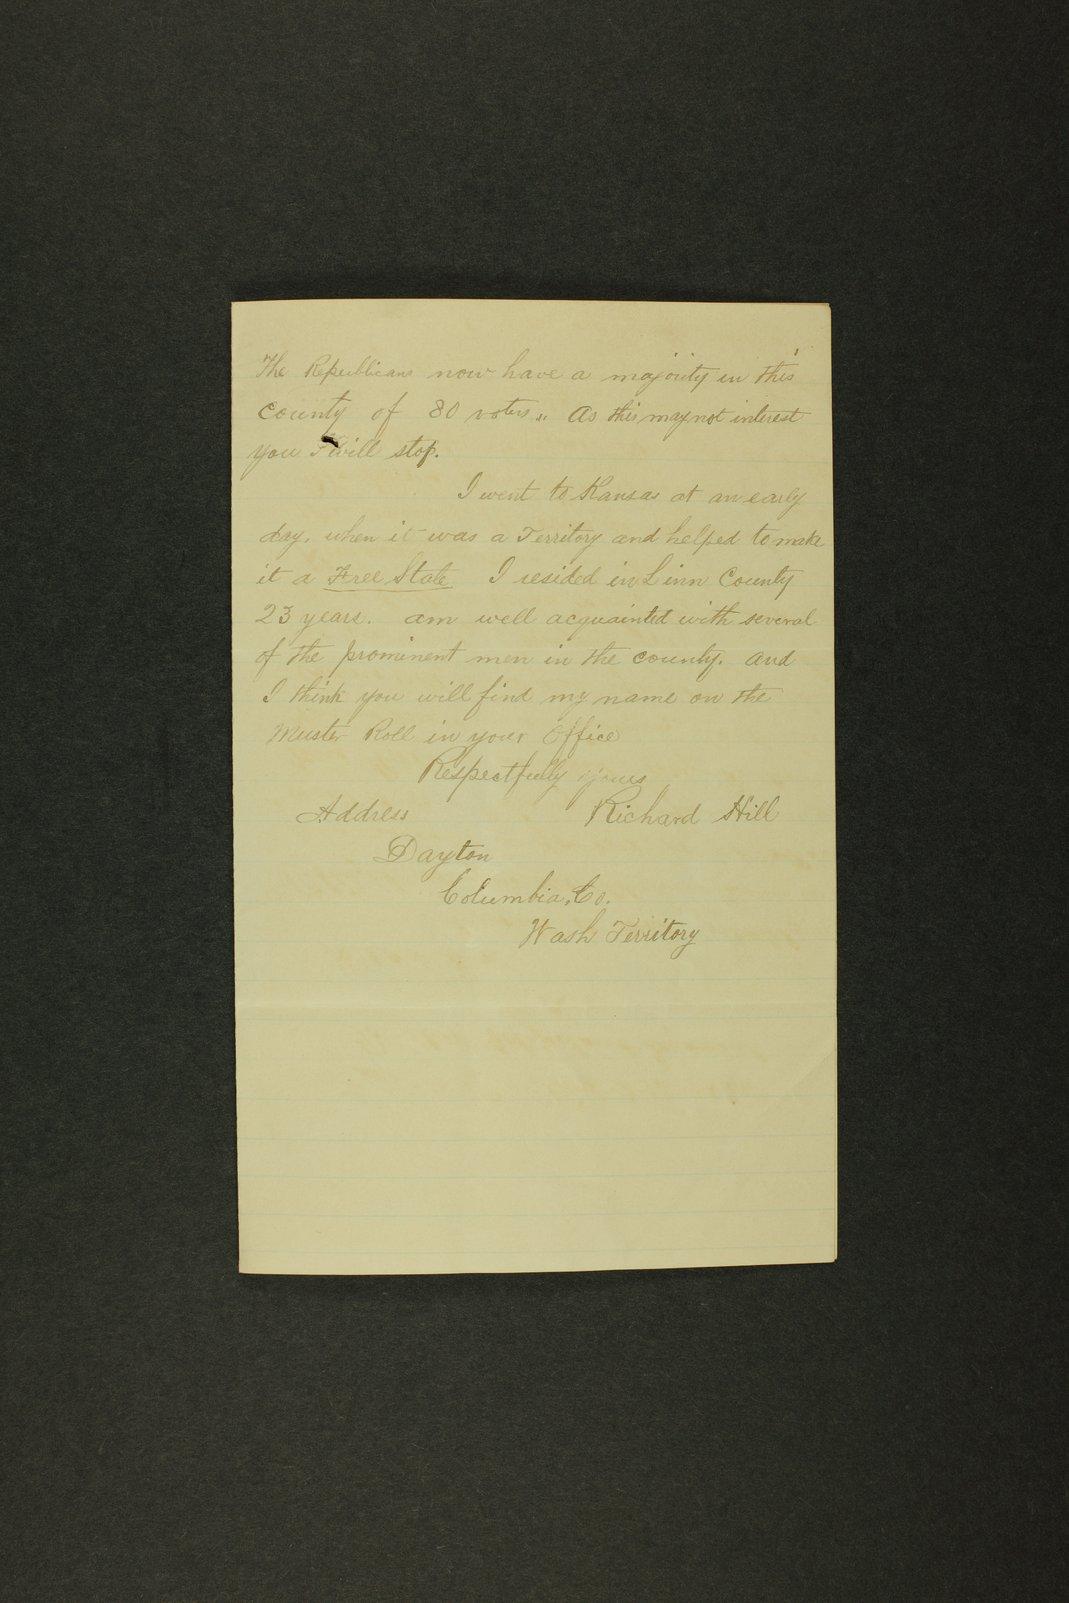 Kansas Adjutant General miscellaneous correpondence - 6